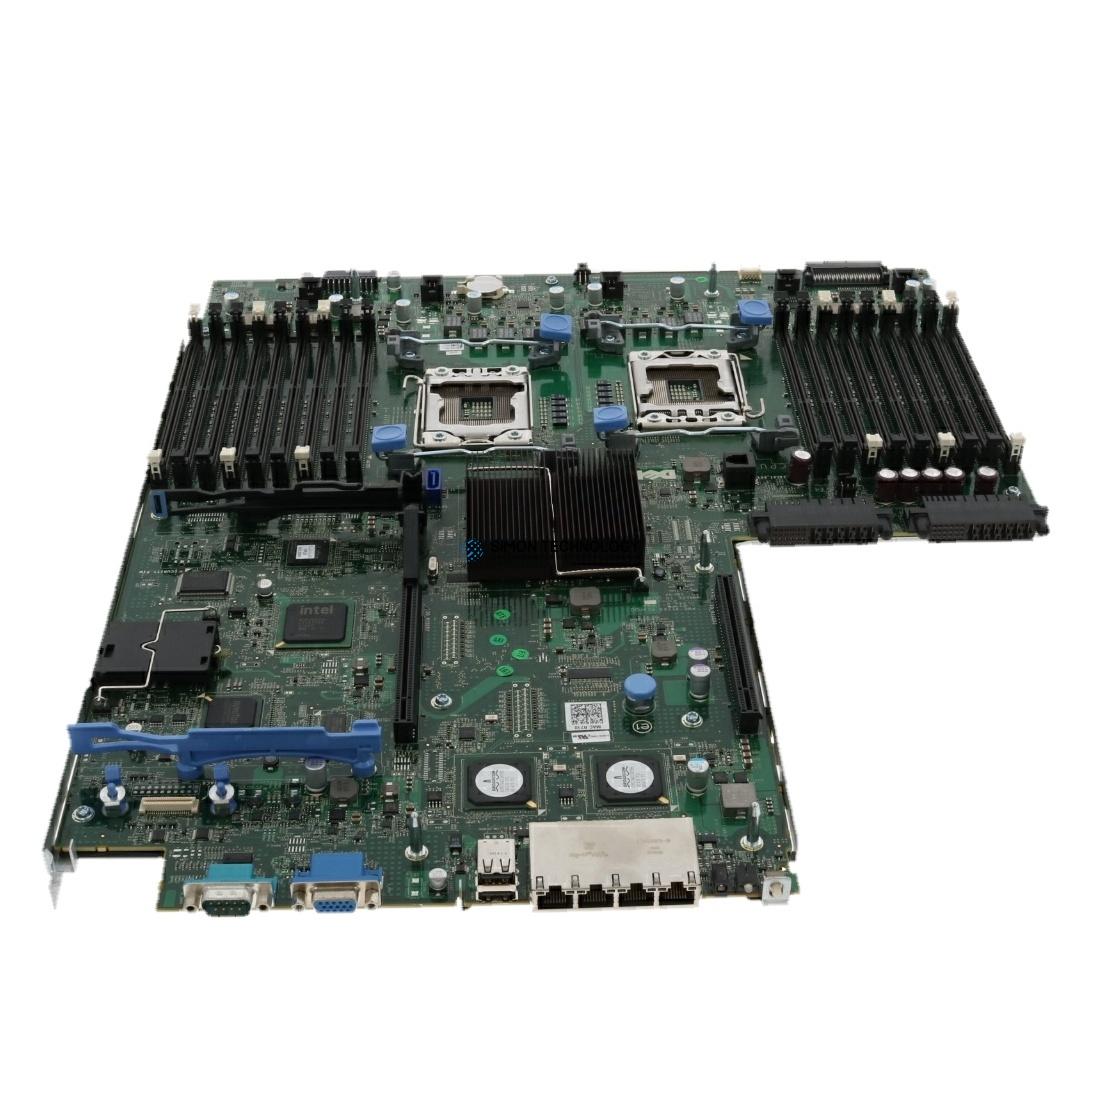 Материнская плата Dell PowerEdge 2.5x8 MD99X Ask for custom qoute (R710-SFF-8-MD99X)